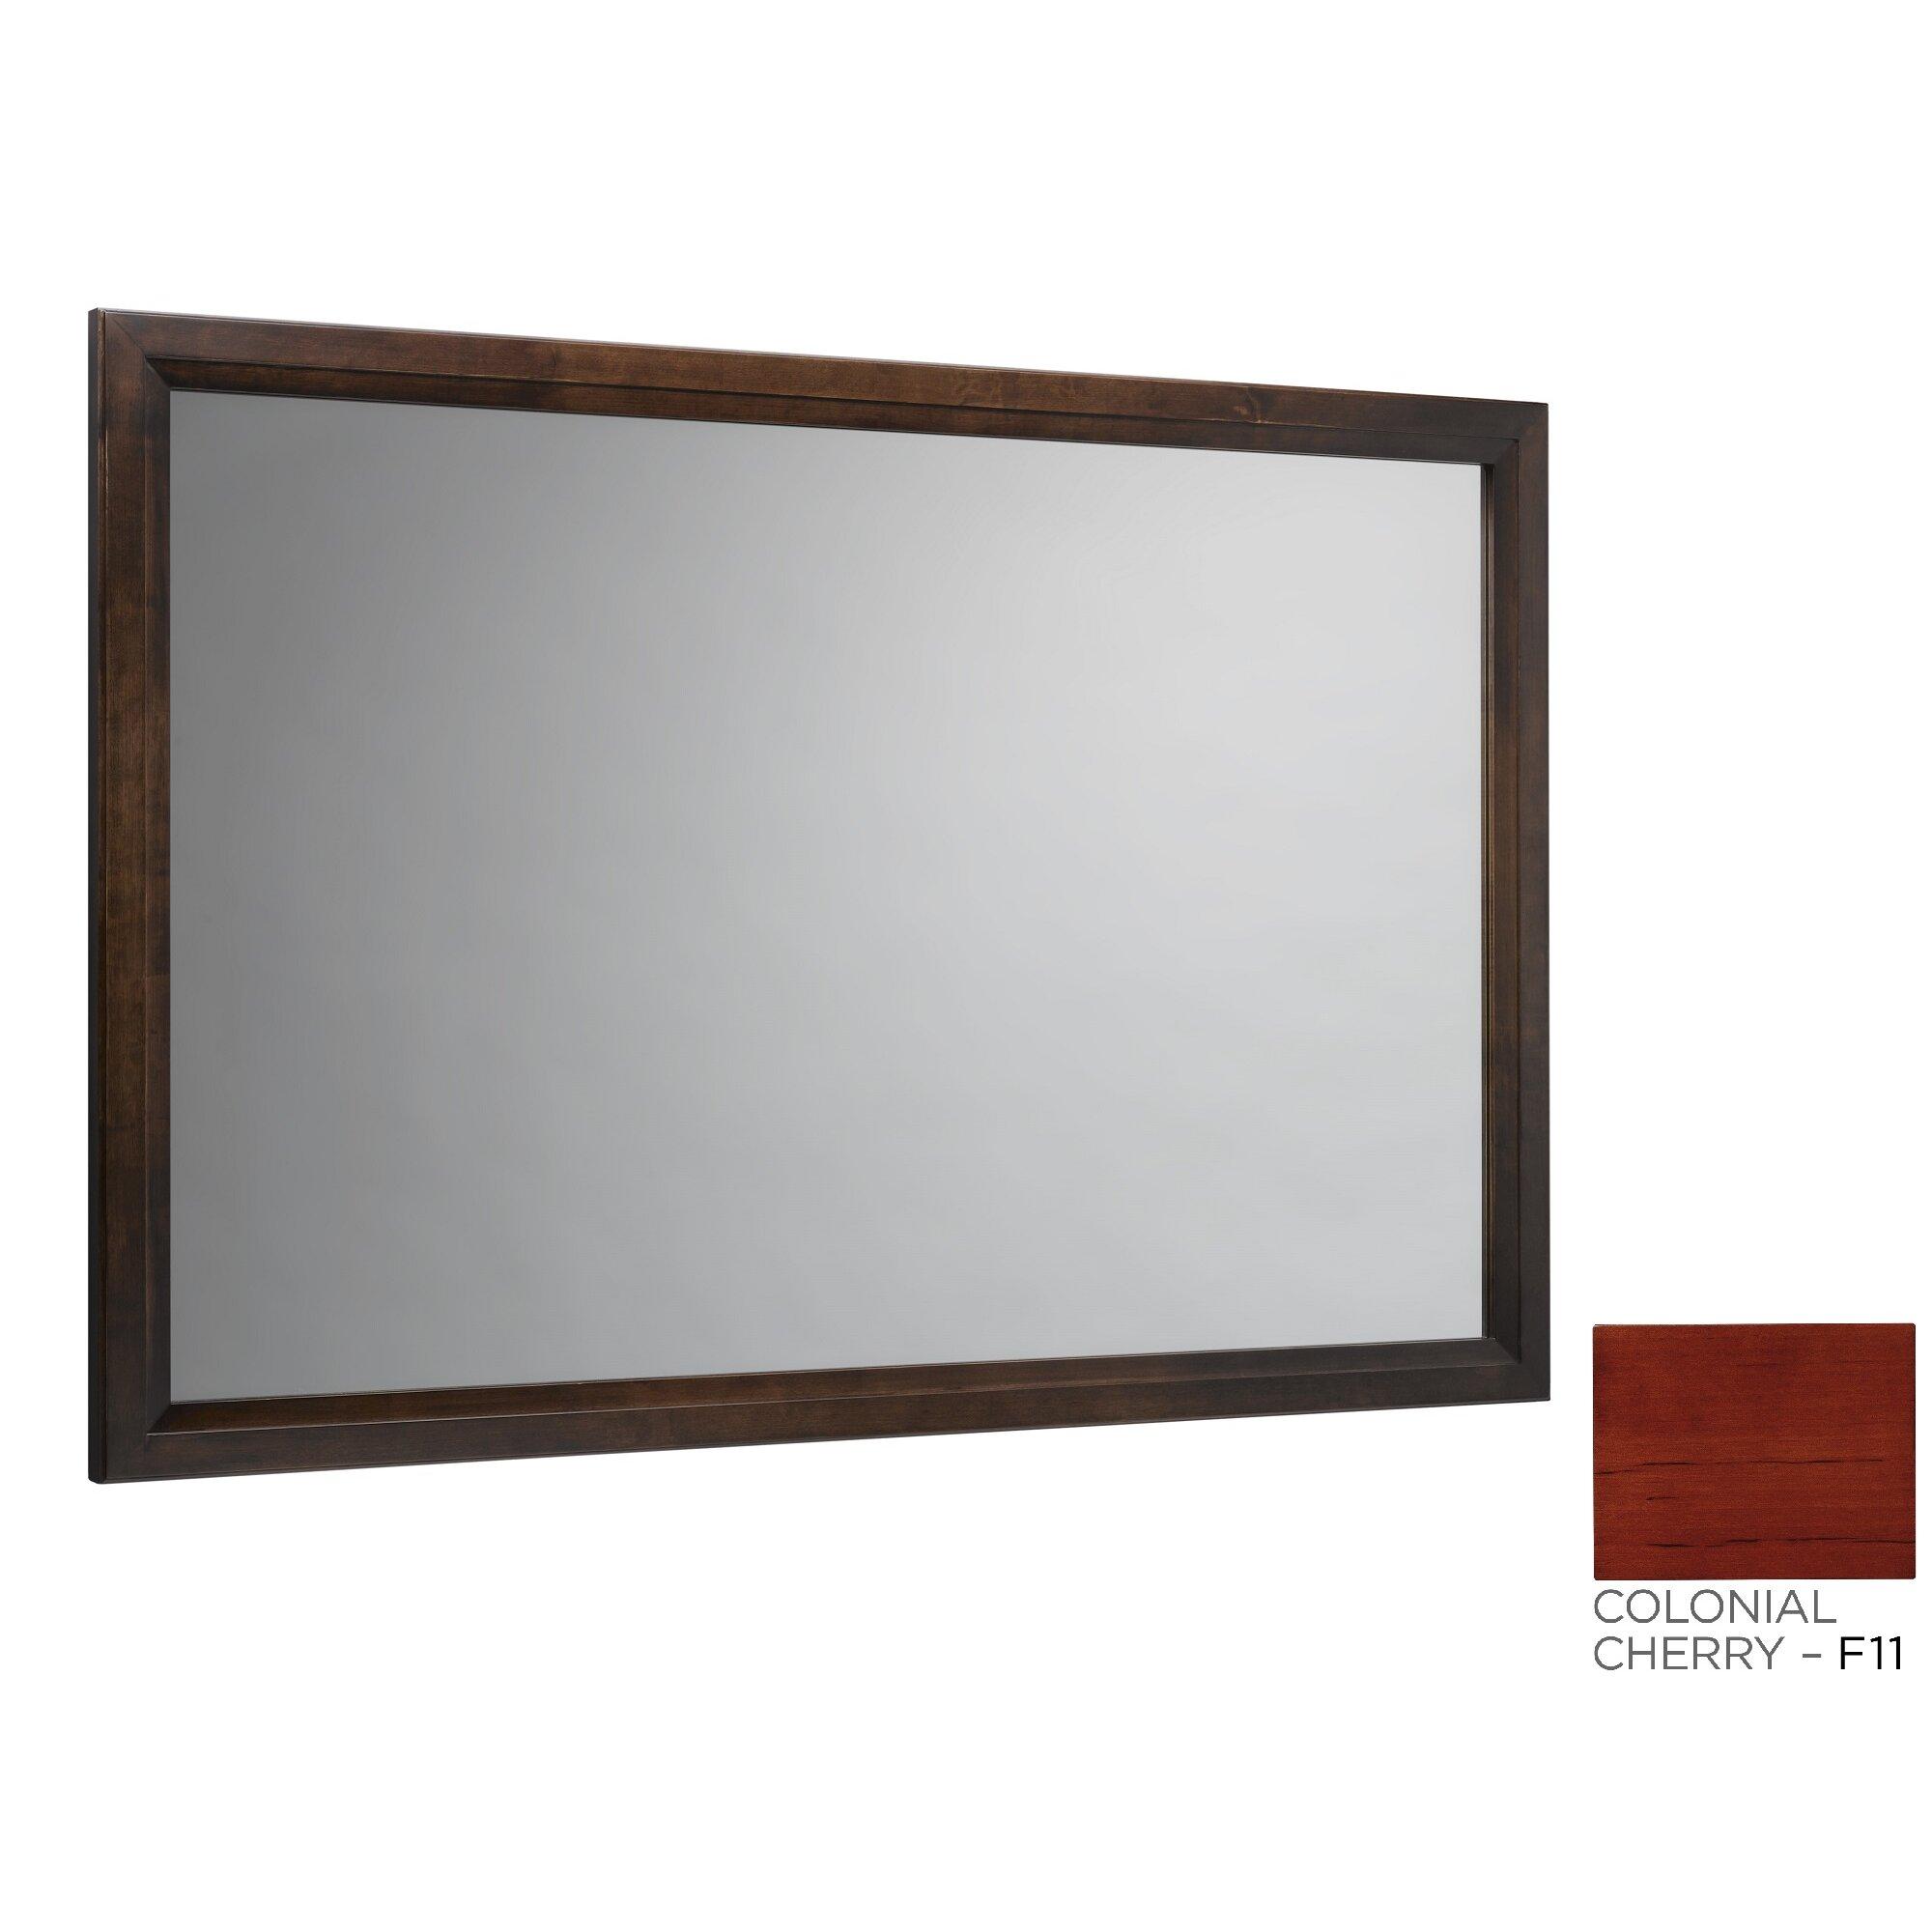 Ronbow Solid Wood Framed Bathroom Mirror In Colonial Cherry Allmodern